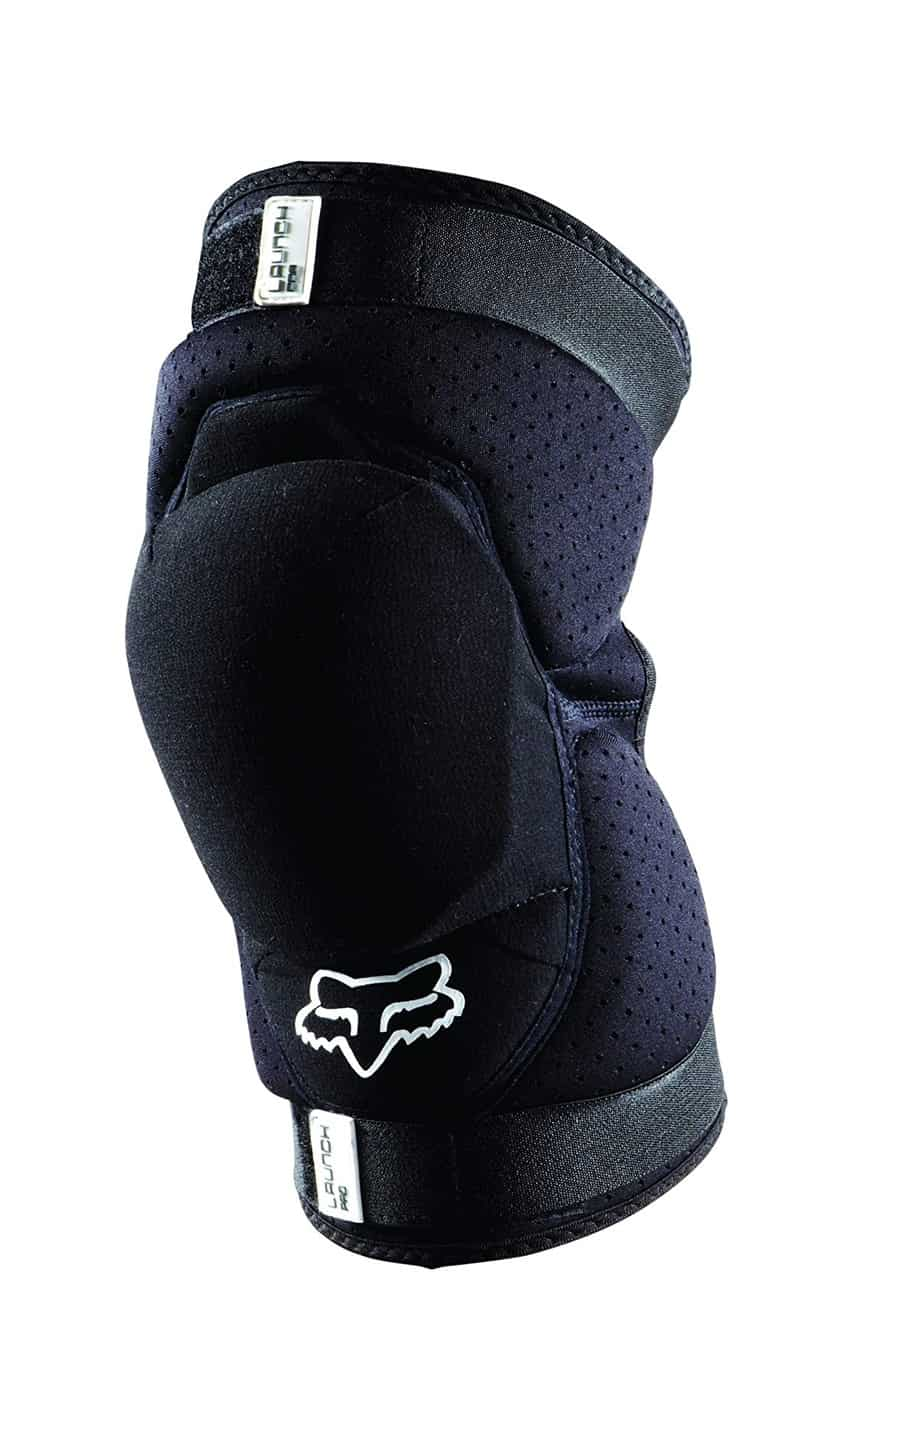 Fox Racing Launch Pro MTB Knee Guard | Amazon